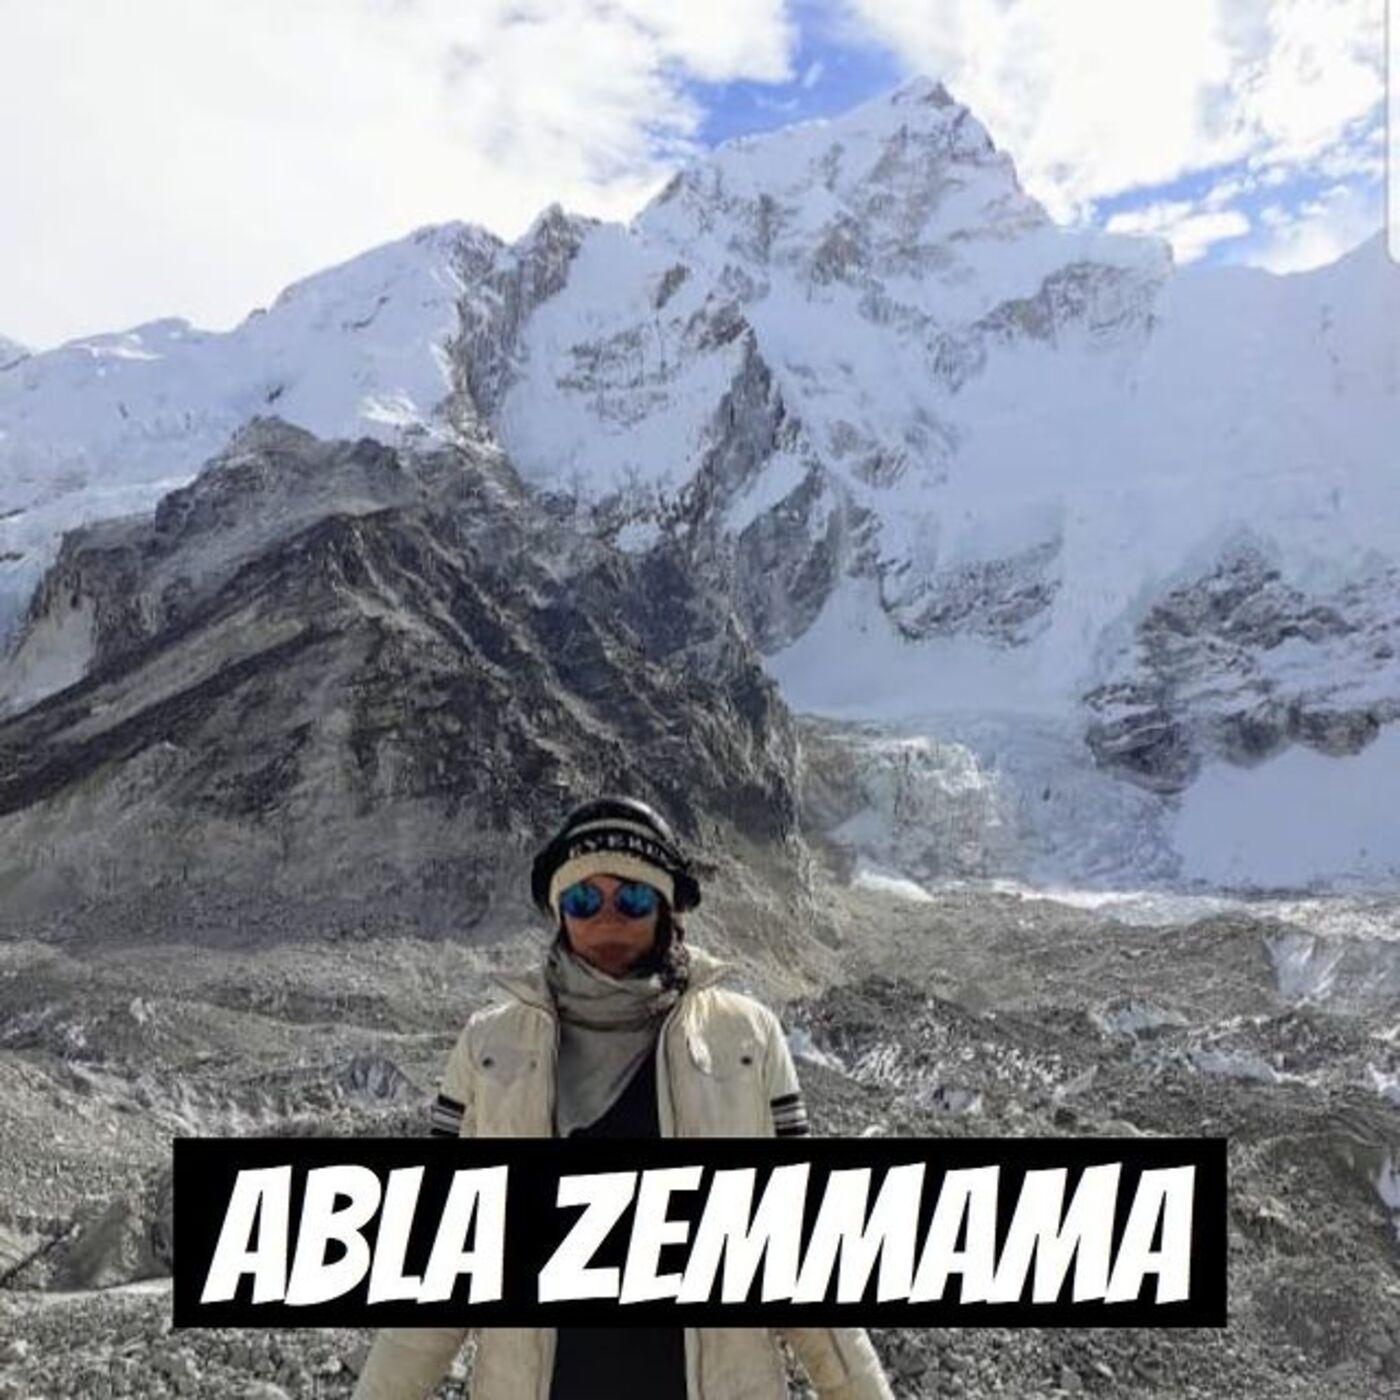 #114 - Abla Zemmama |Addiction [ENGLISH]